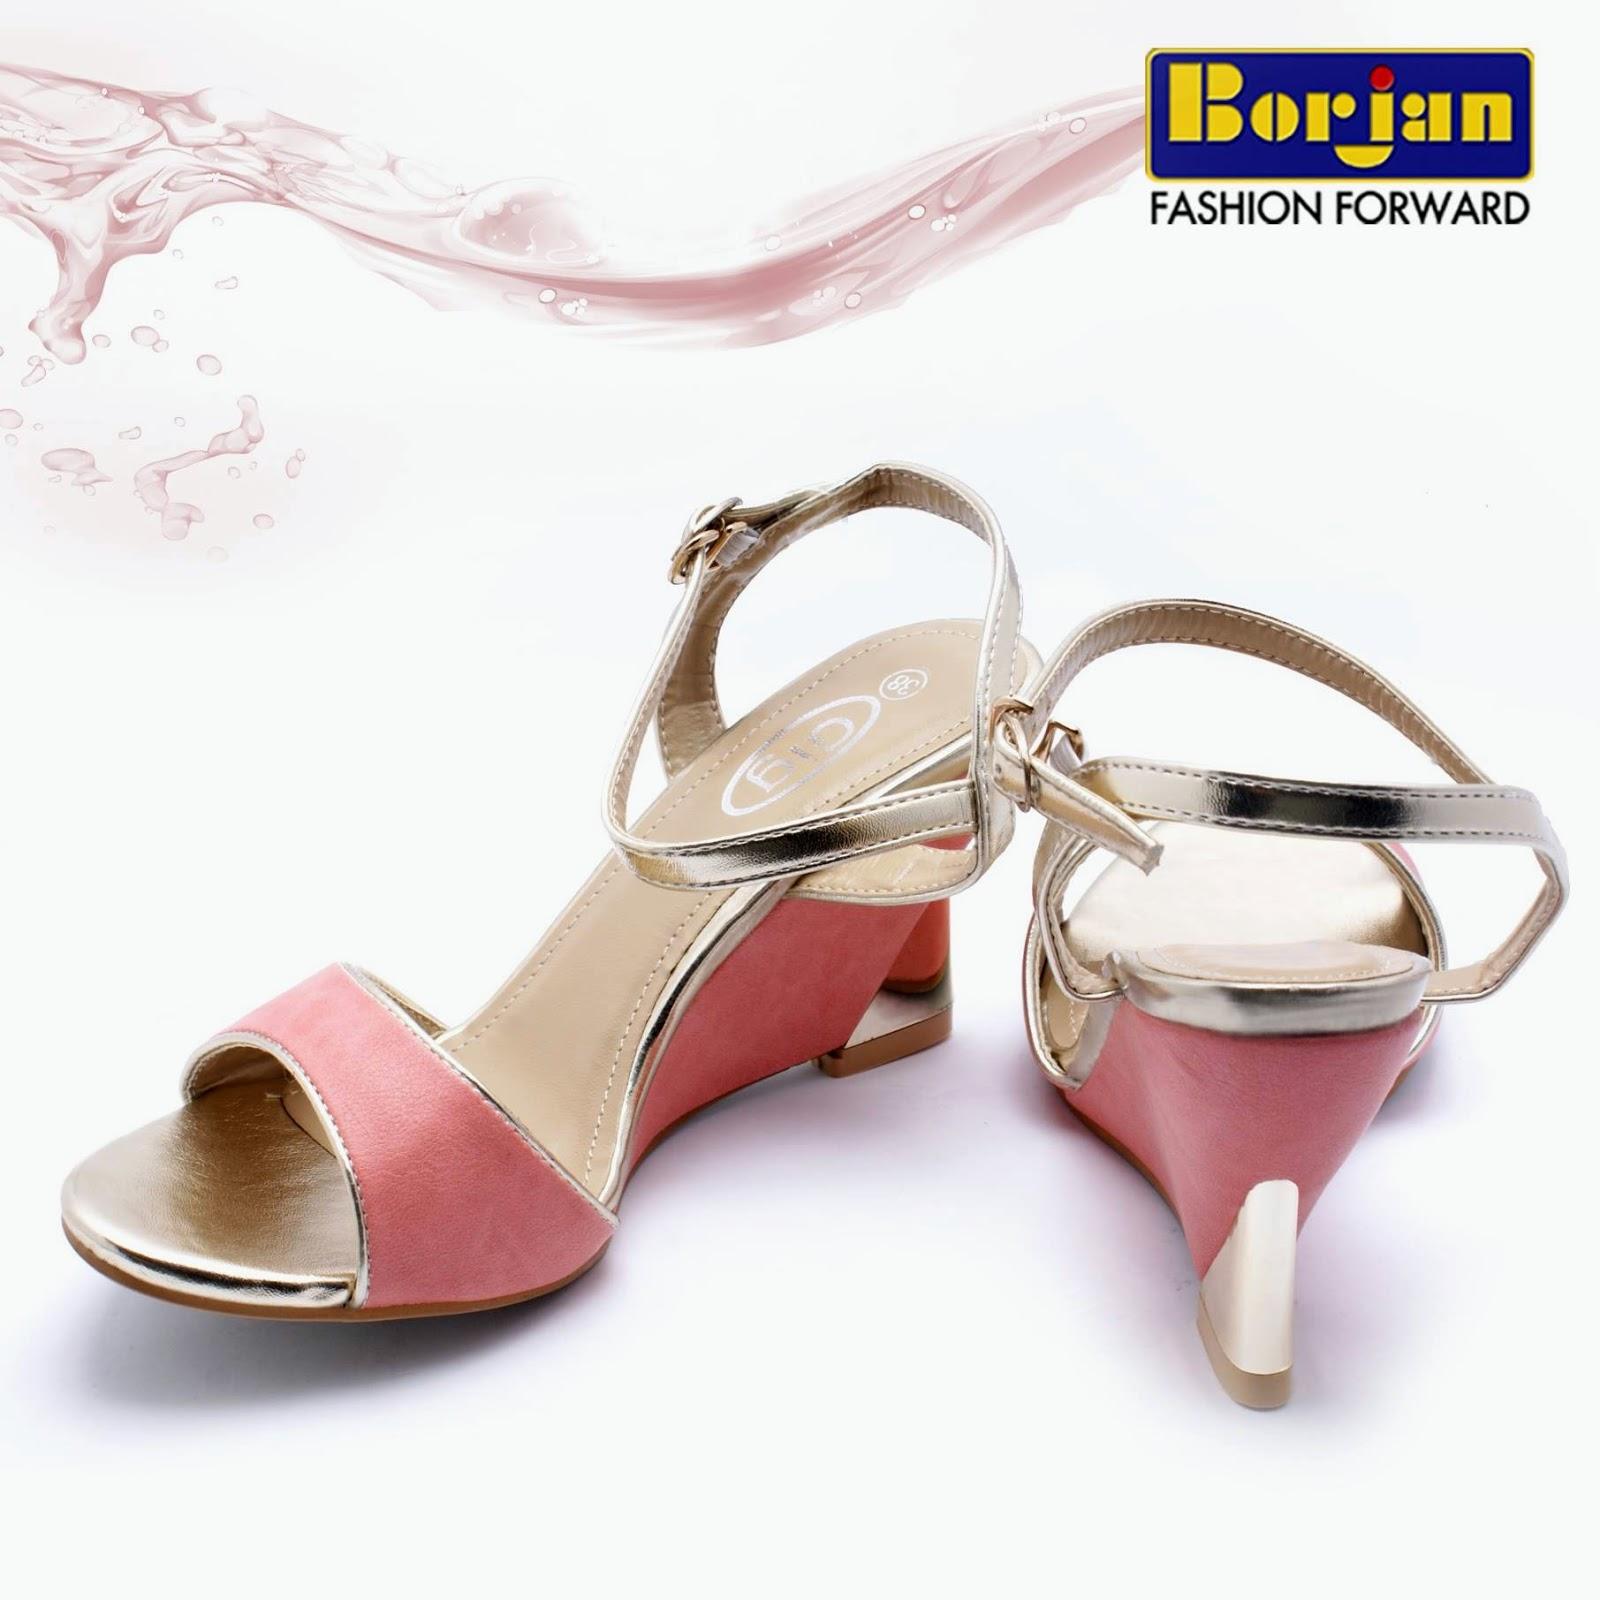 to wear - Trendy new Borjan ladies shoes for eid video